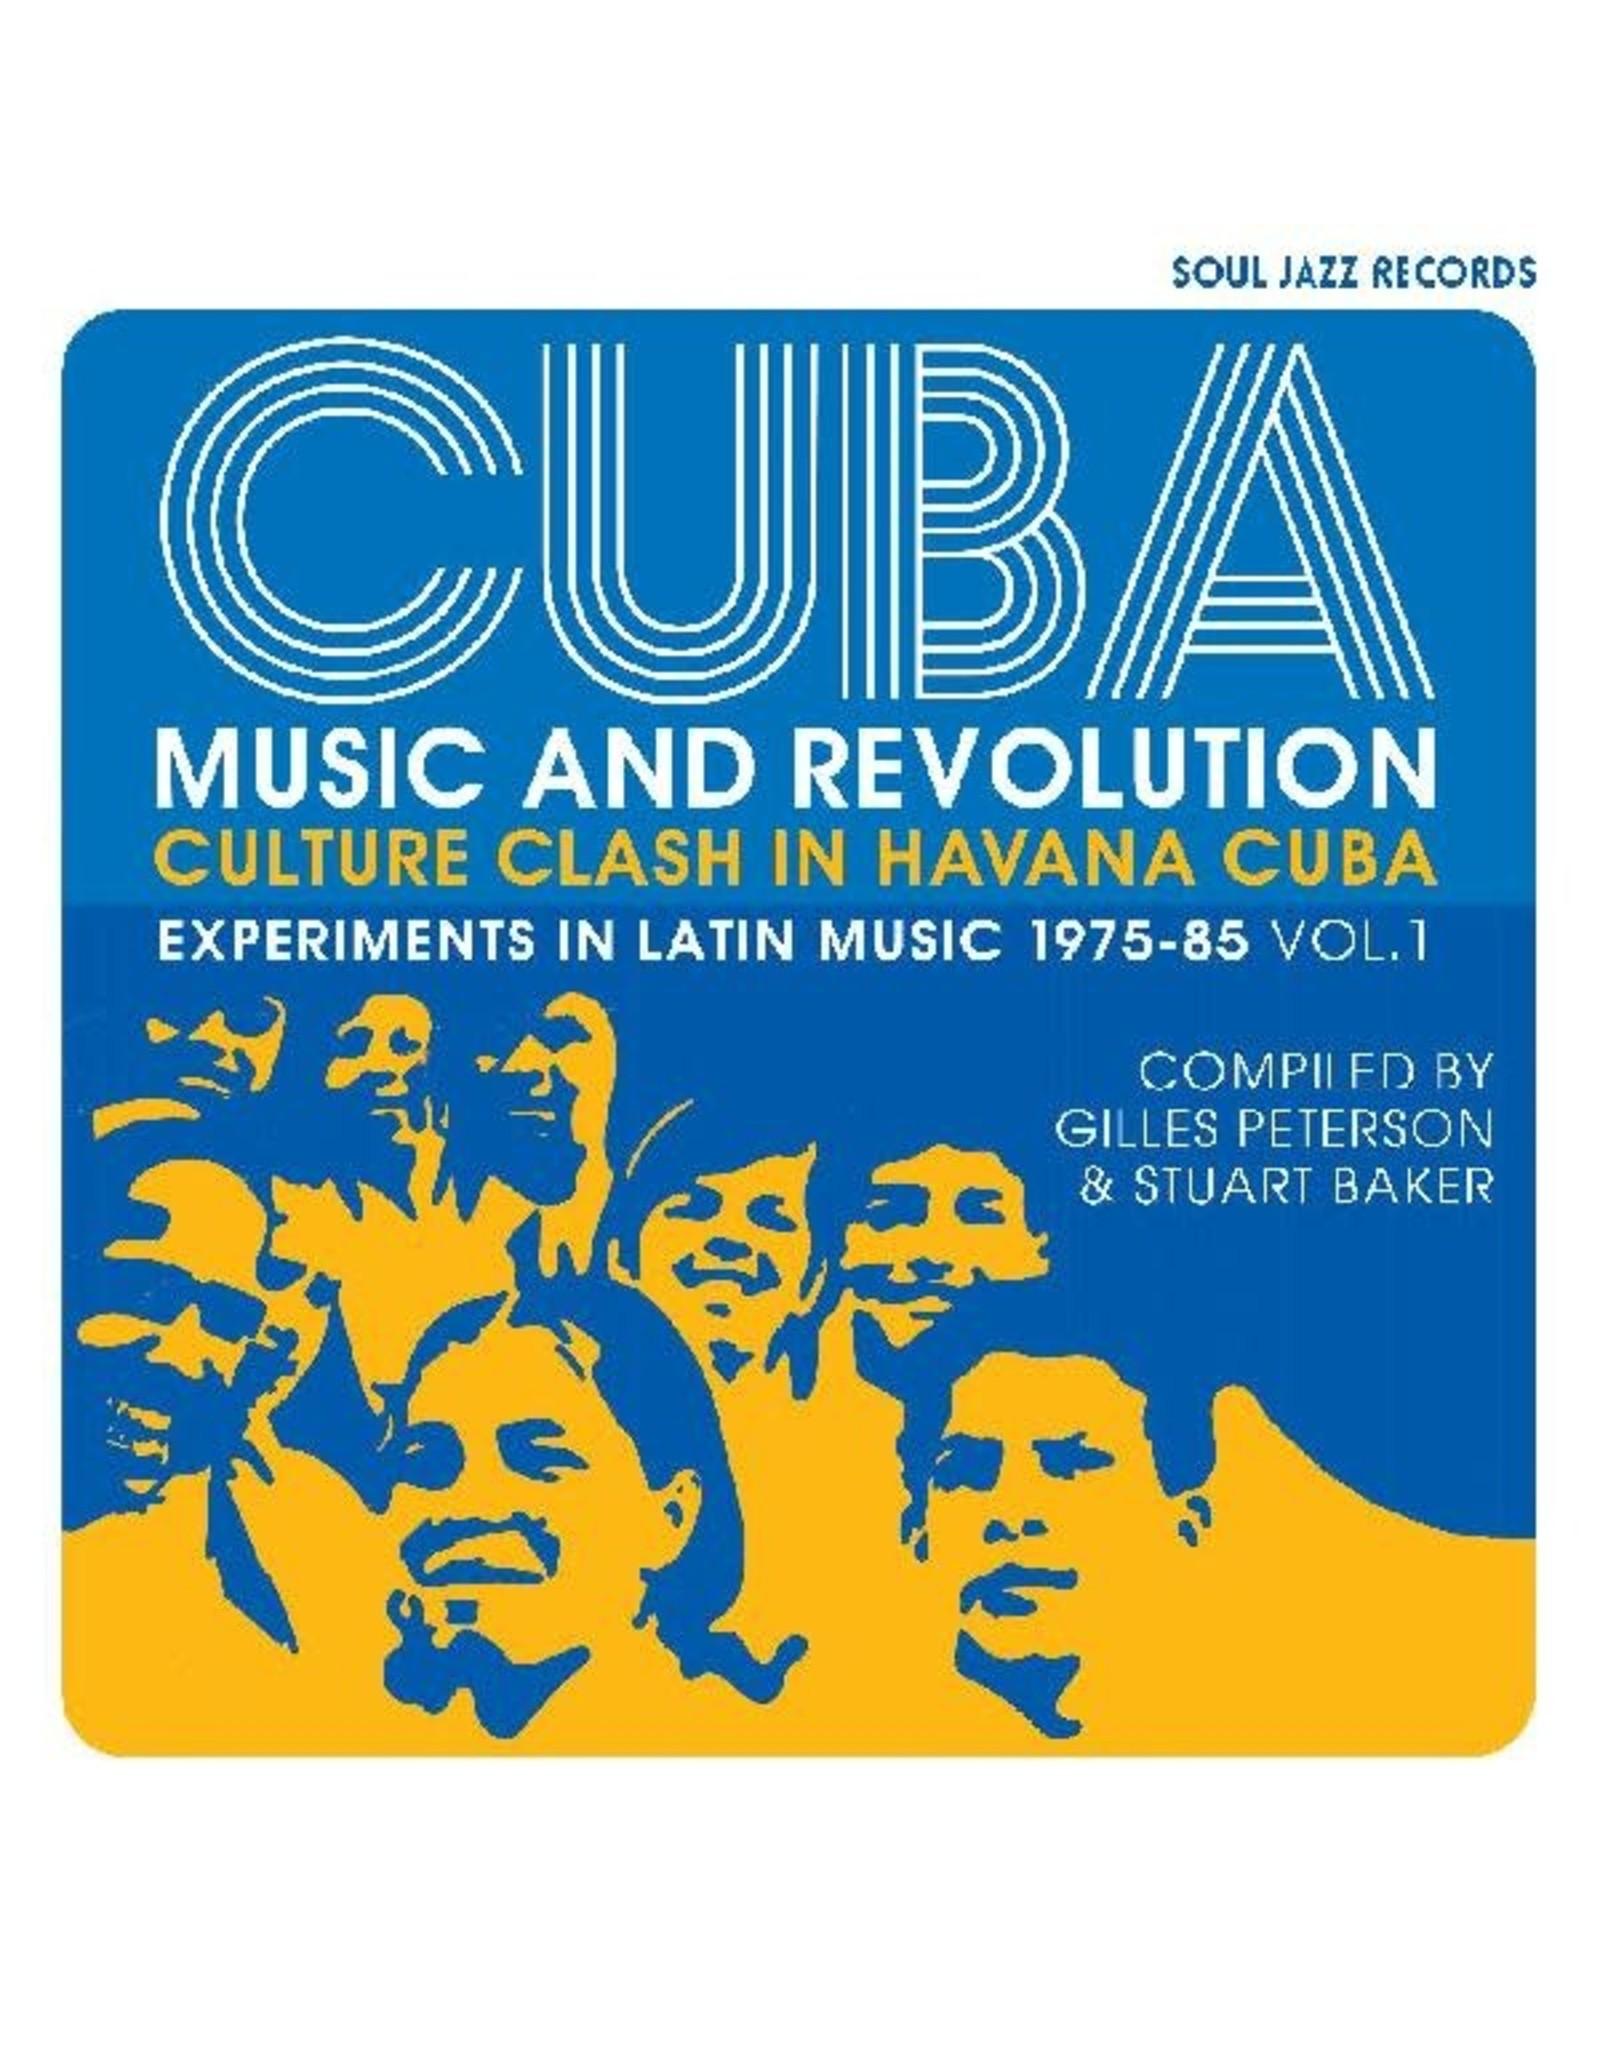 New Vinyl Various - CUBA: Music And Revolution - Culture Clash In Havana: Experiments In Latin Music 1975-85 Vol. 1 3LP